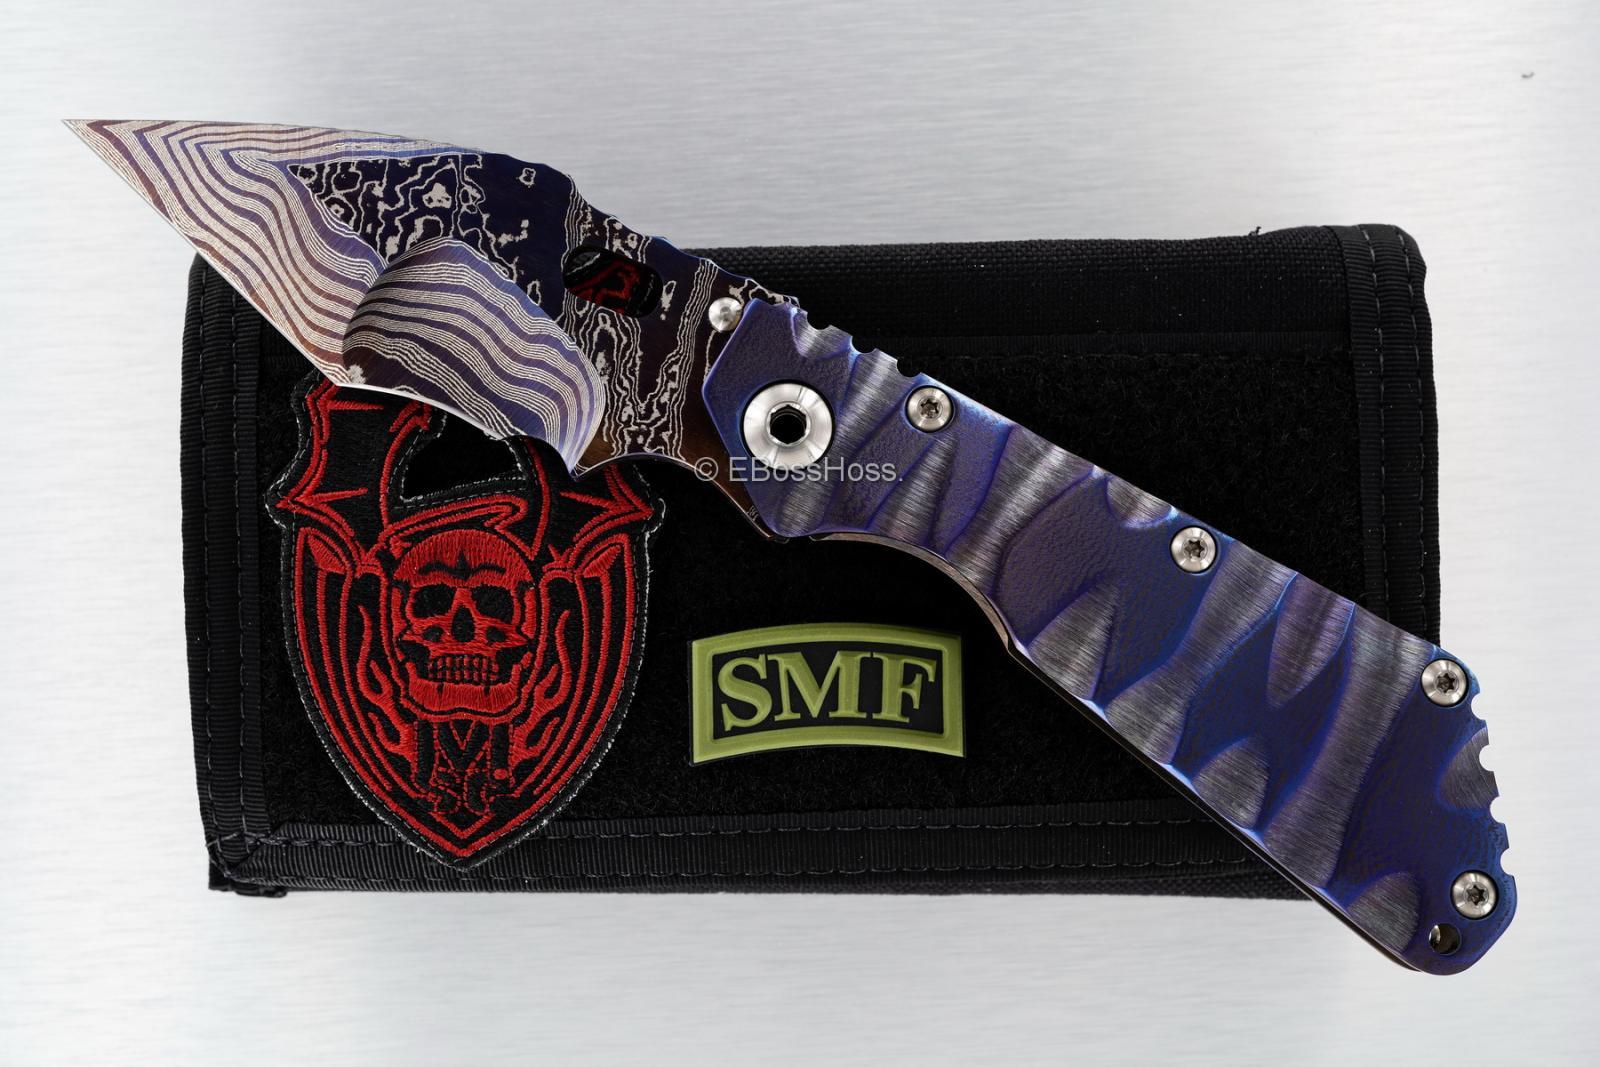 Mick Strider Custom (MSC) Cobalt-Damascus Tanto SMF - Nightmare Dragon-grind